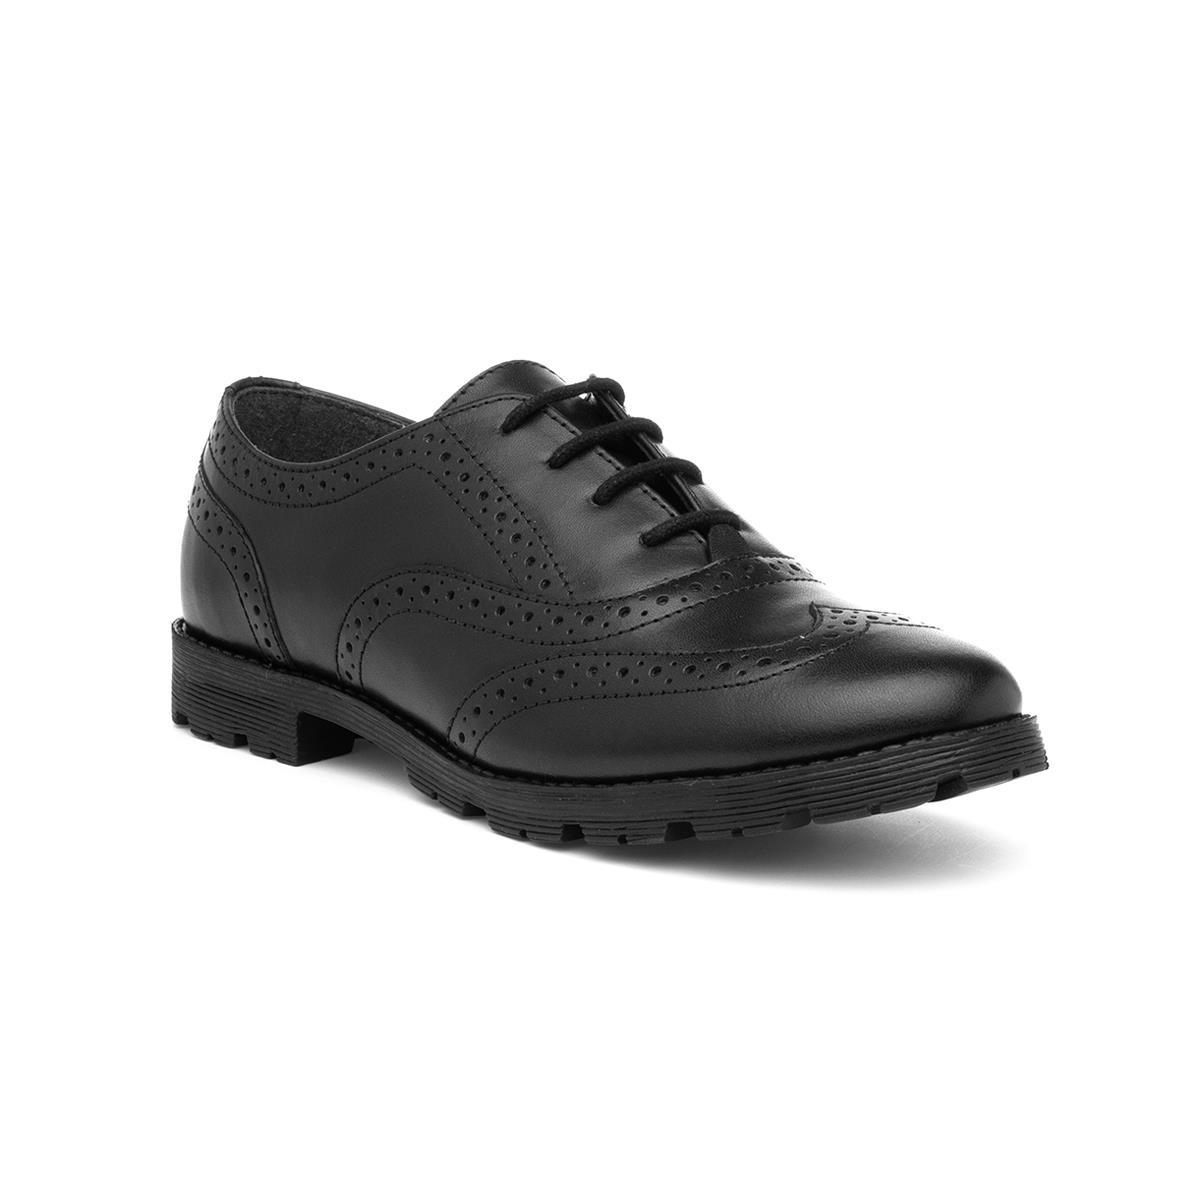 plain black shoes for girls online